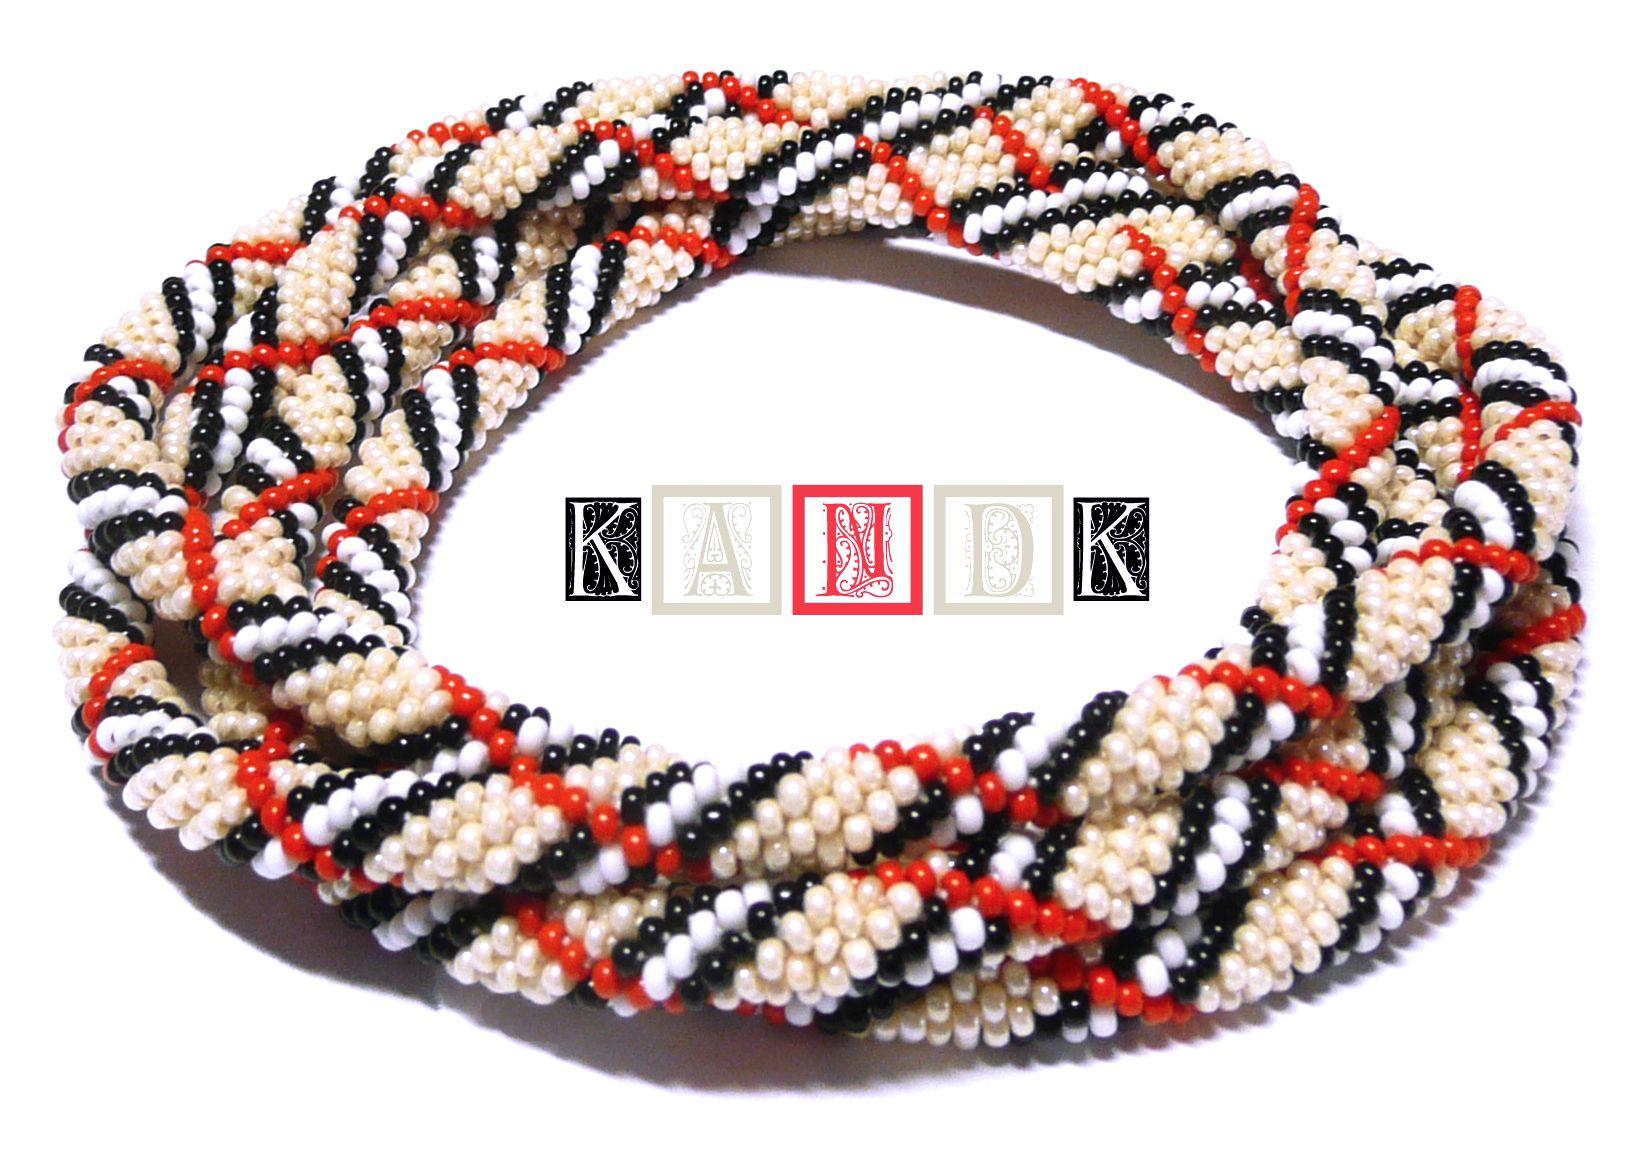 beads string kandk burberry classy